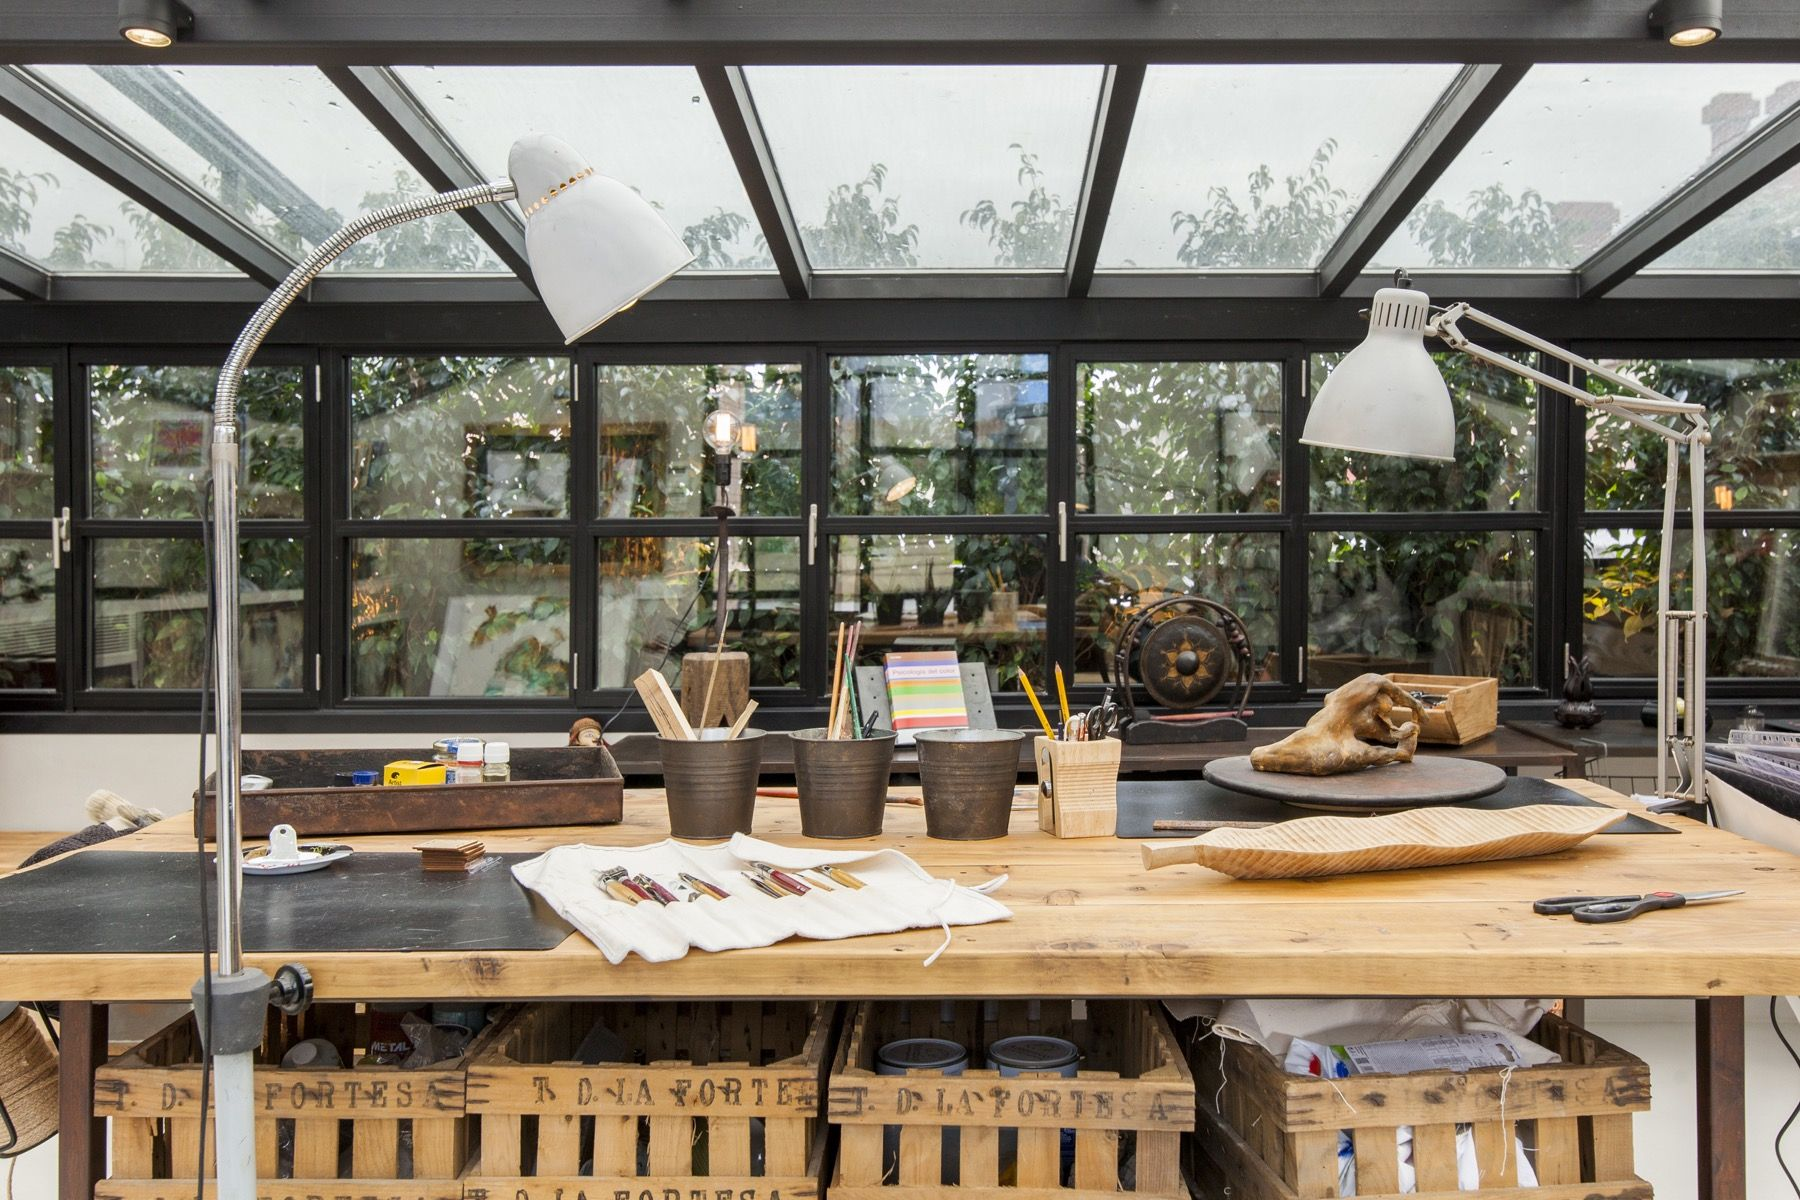 Atelier. Oficina: Proyectos de Interiorismo Miriam Barrio